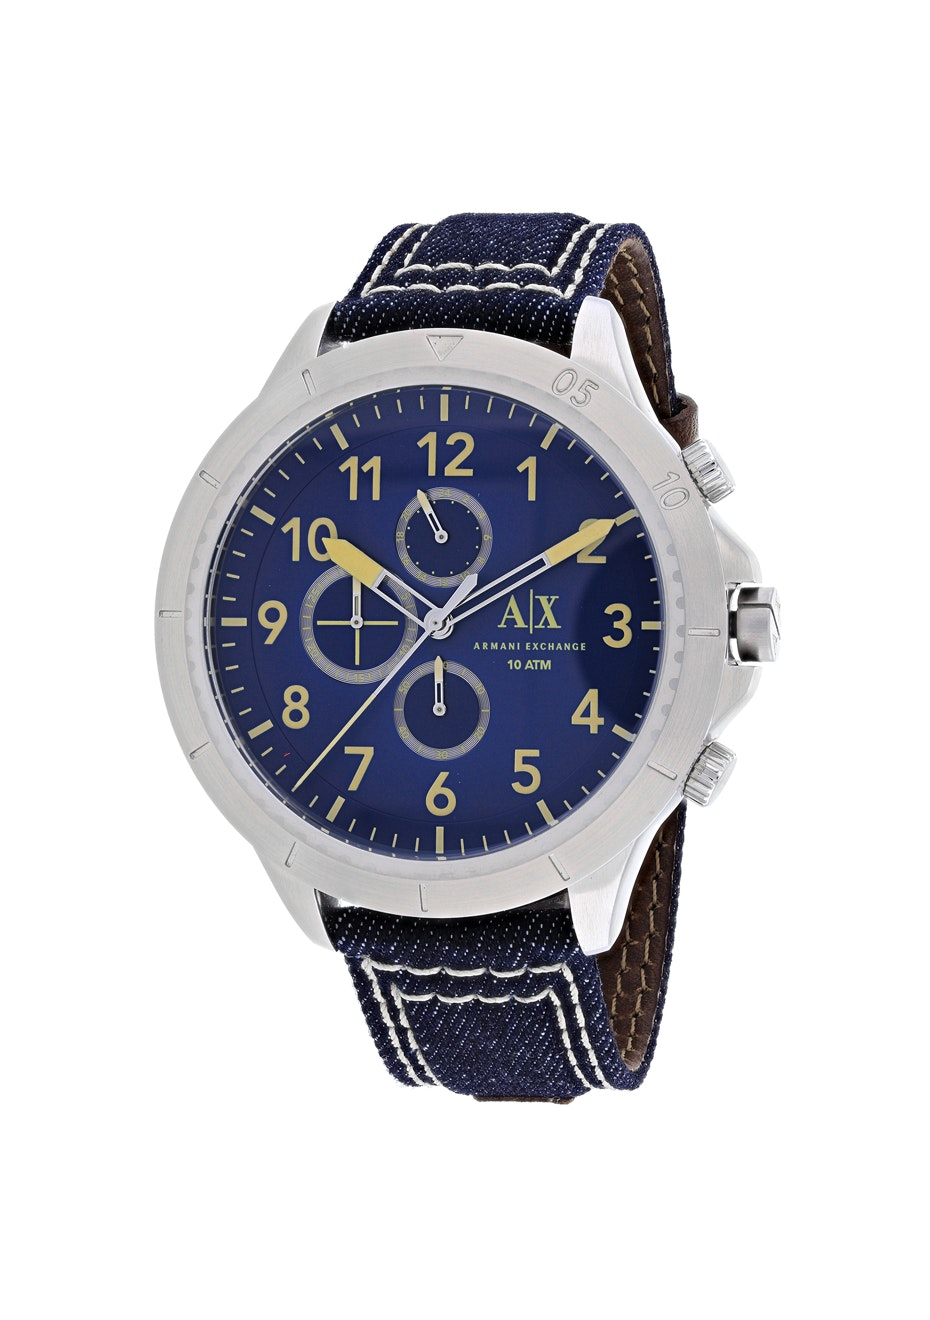 Armani Exchange Men's Chronograph - Blue/Blue